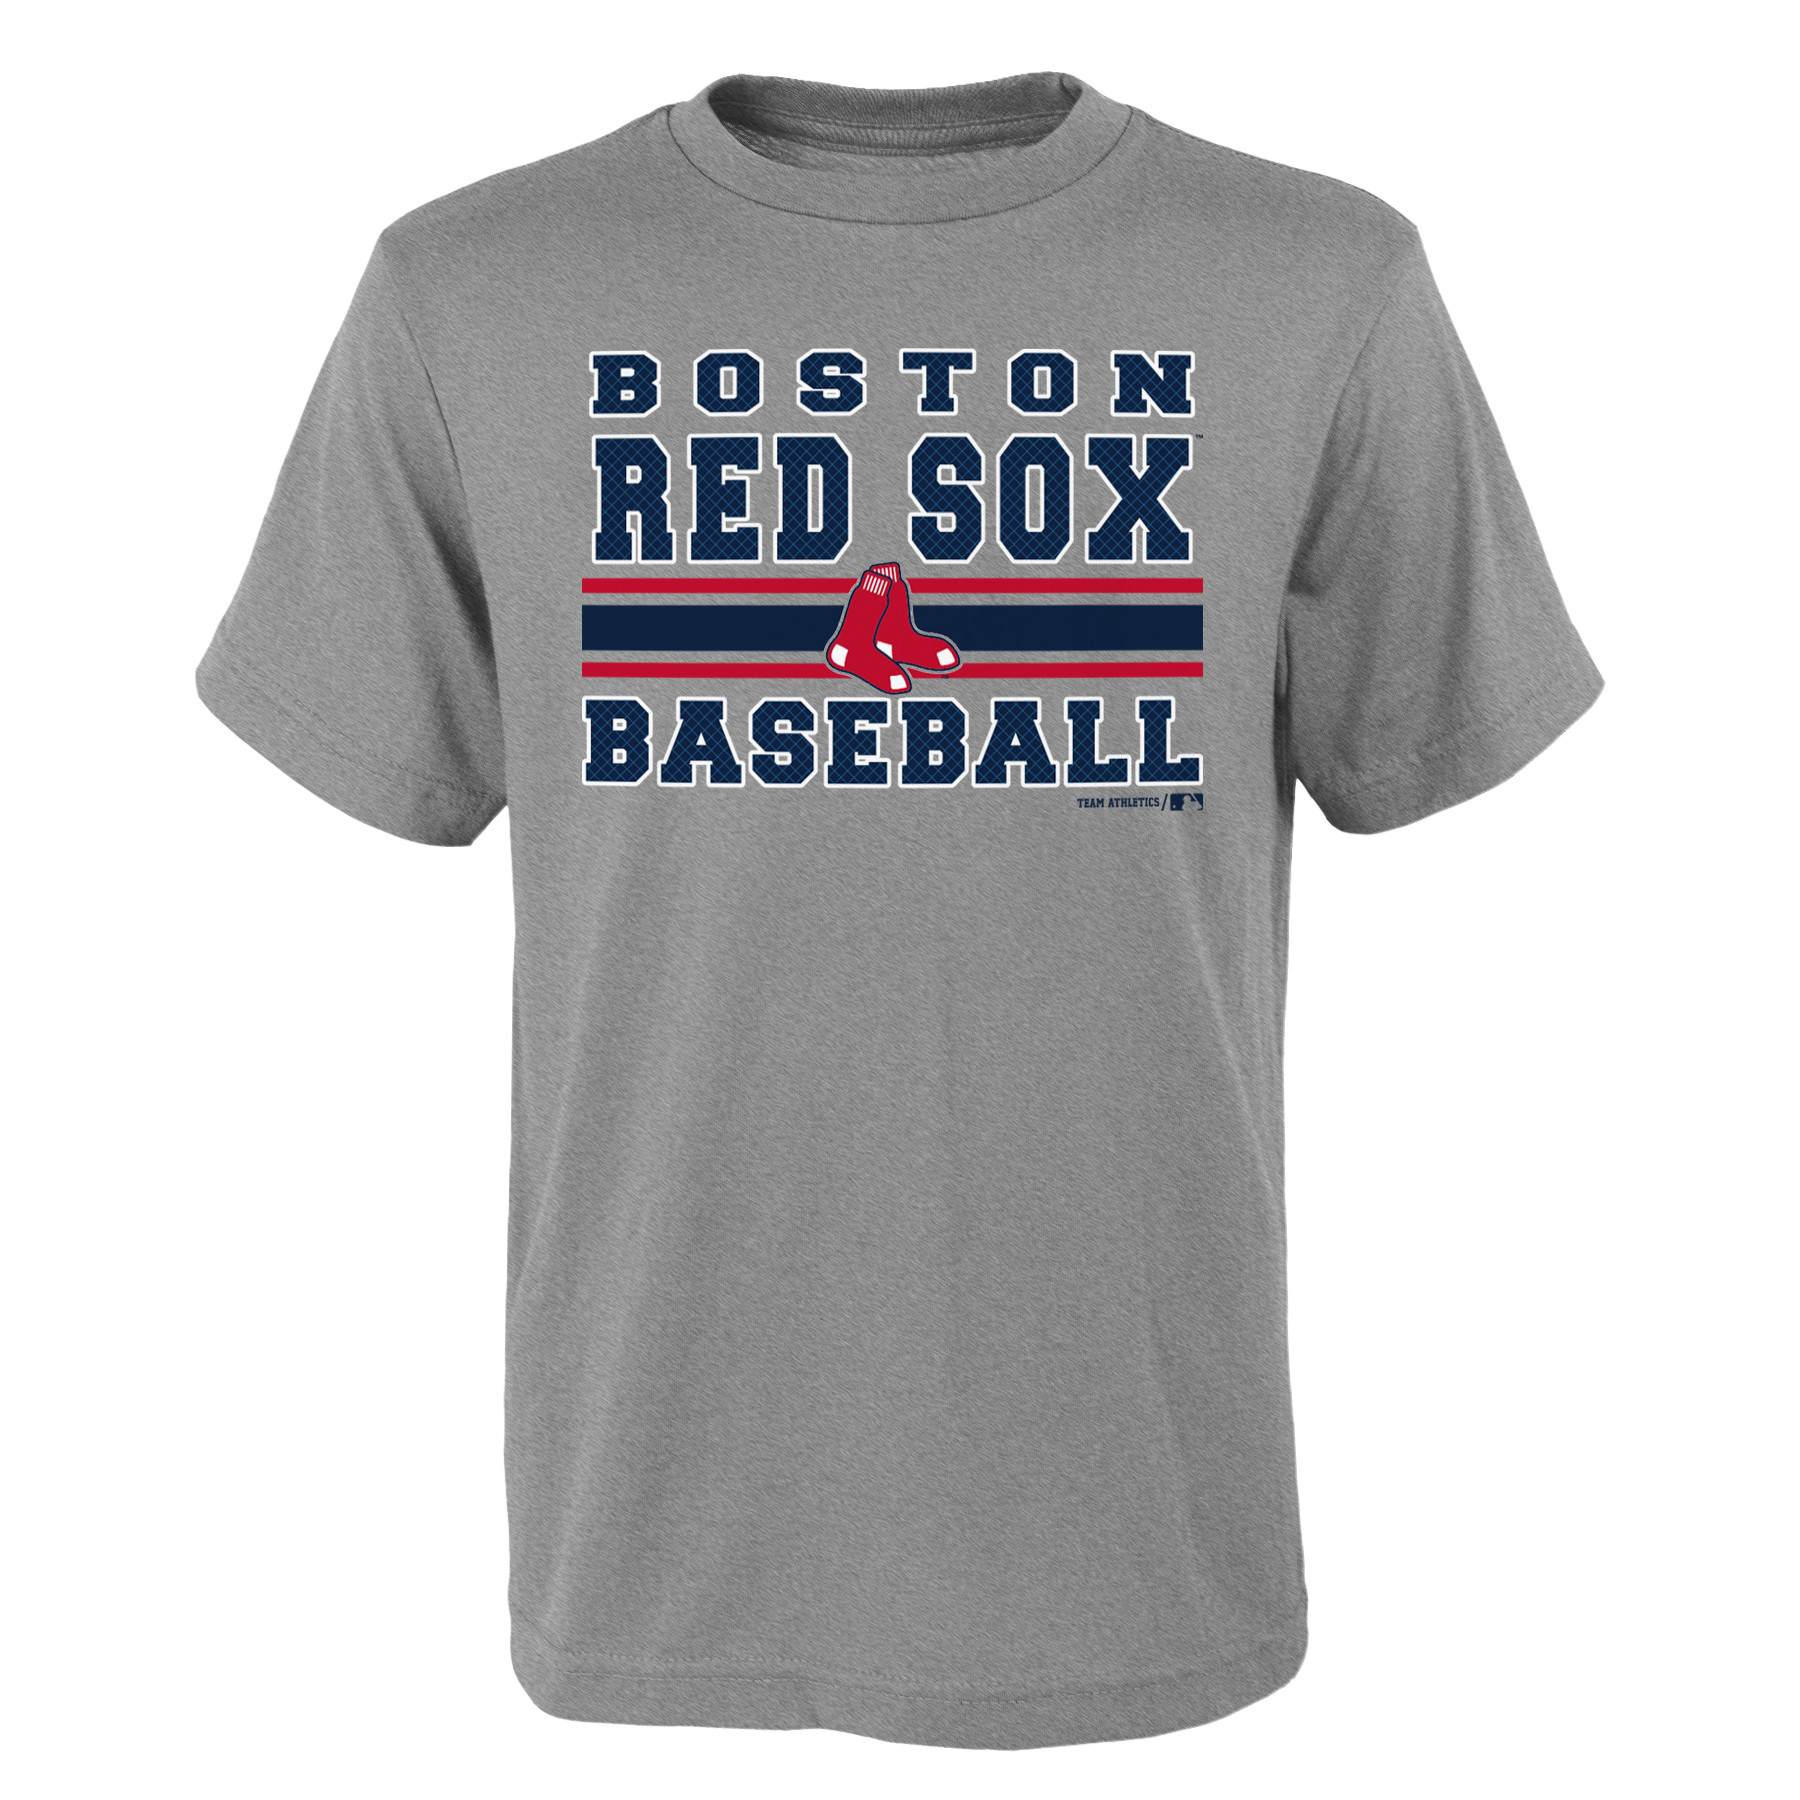 MLB Boston RED SOX TEE Short Sleeve Boys OPP 90% Cotton 10% Polyester Gray Team Tee 4-18